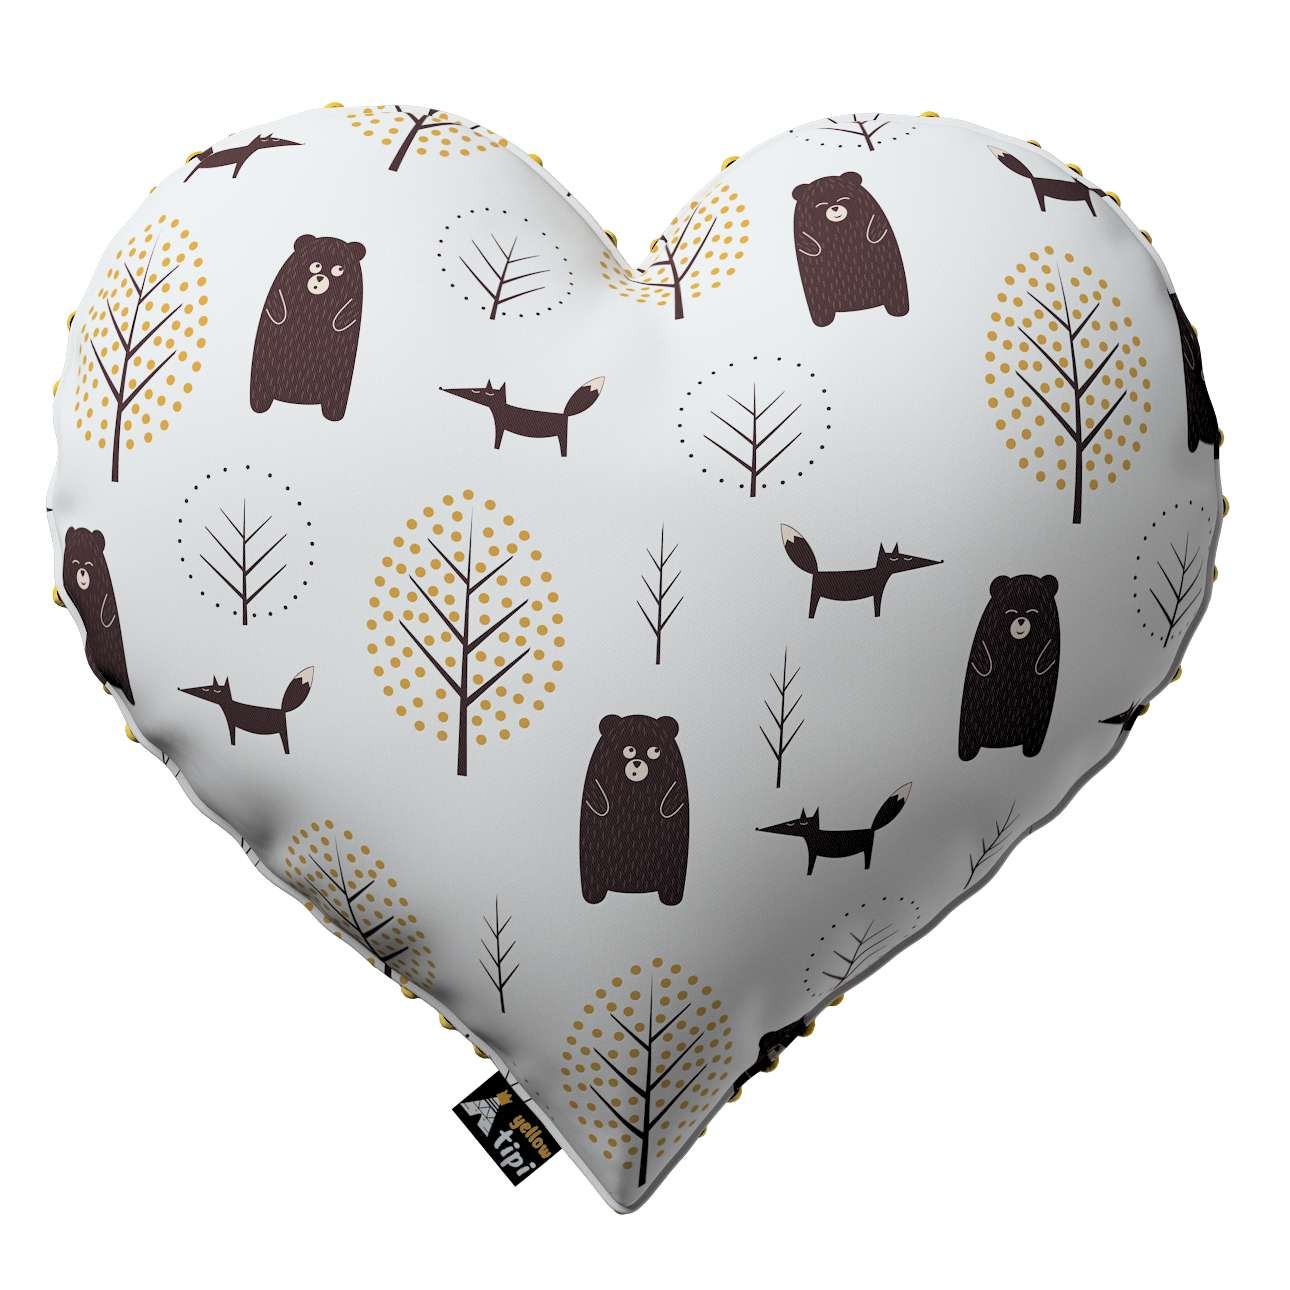 Heart of Love pagalvėlė kolekcijoje Magic Collection, audinys: 500-19